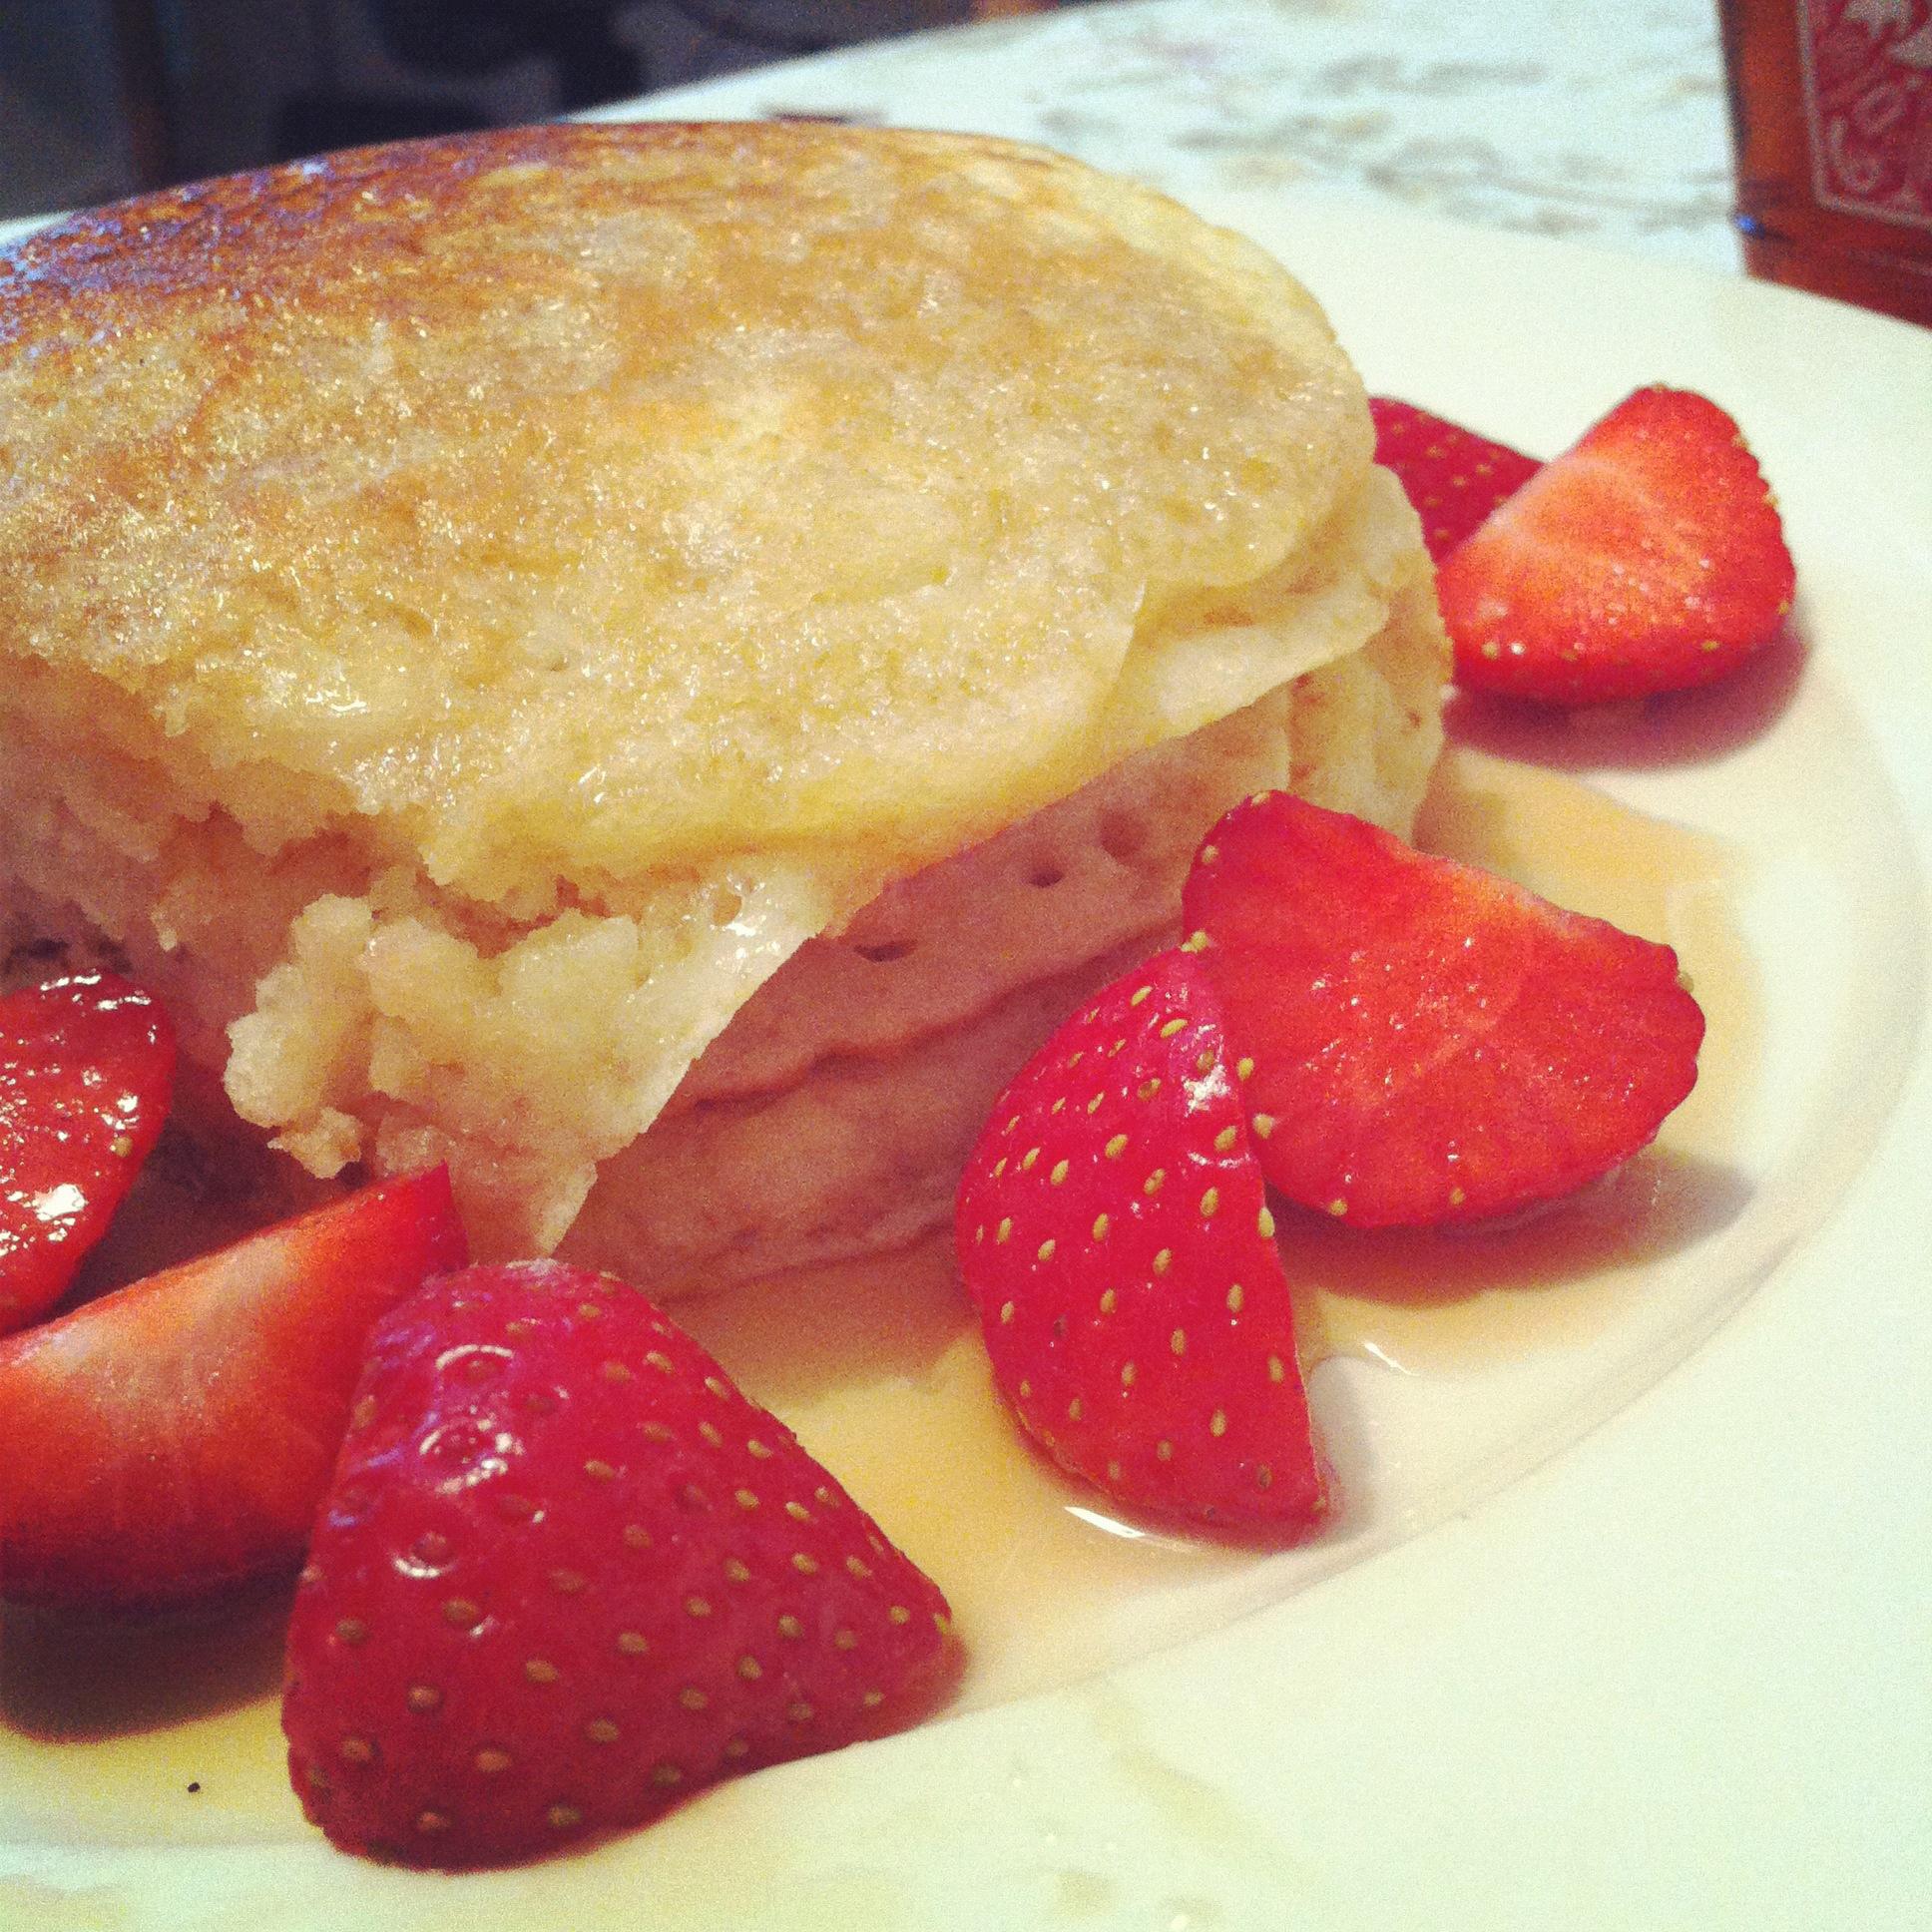 Best ever pancakes